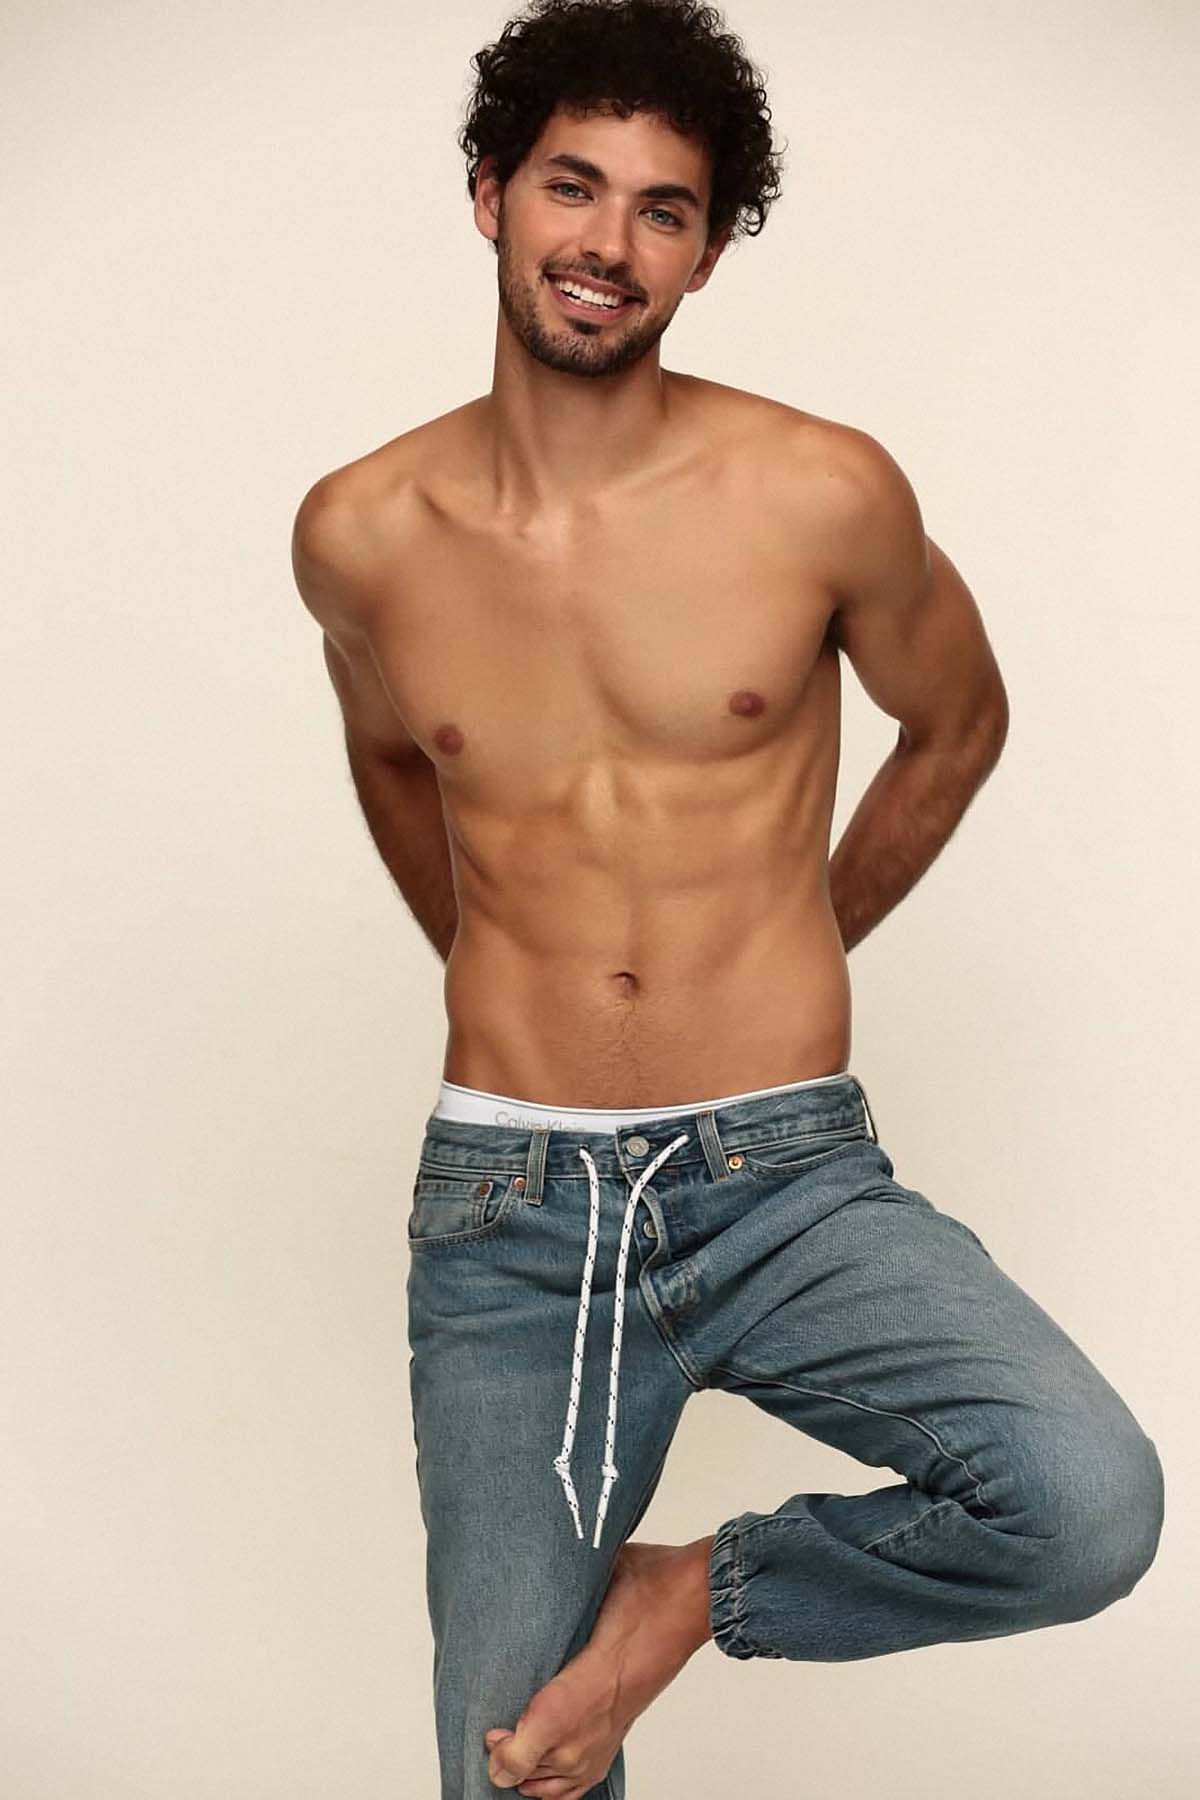 José Bernardo by Pupin & Deleu for Brazilian Male Model